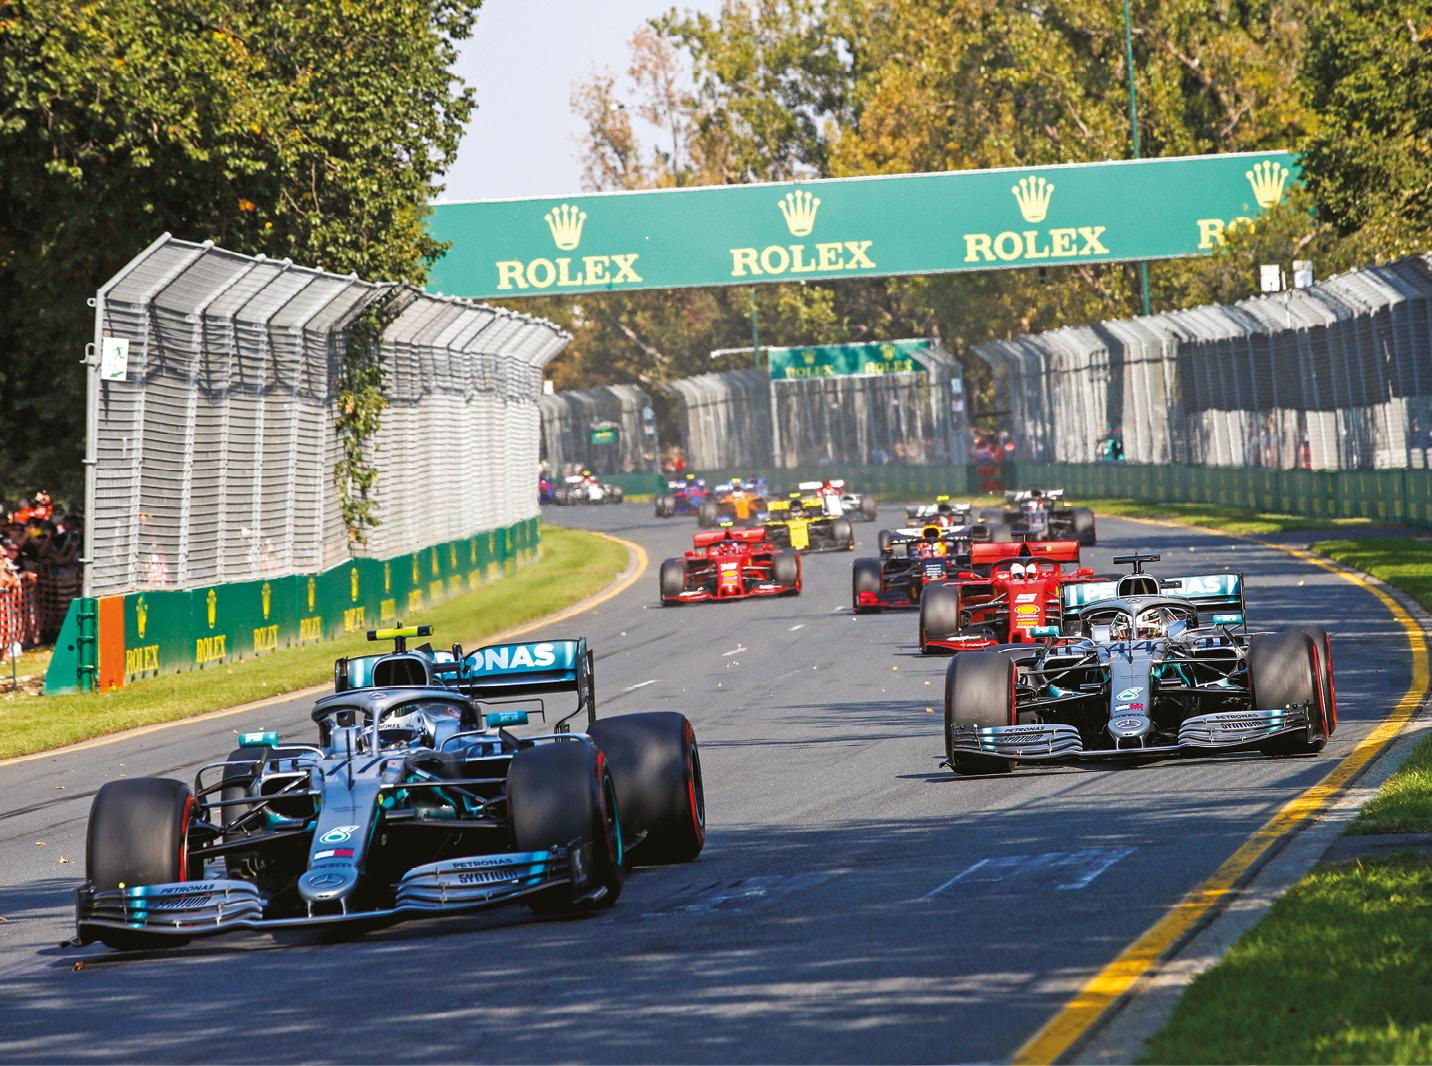 Bottas won in Australia, but soon lost momentum against Hamilton